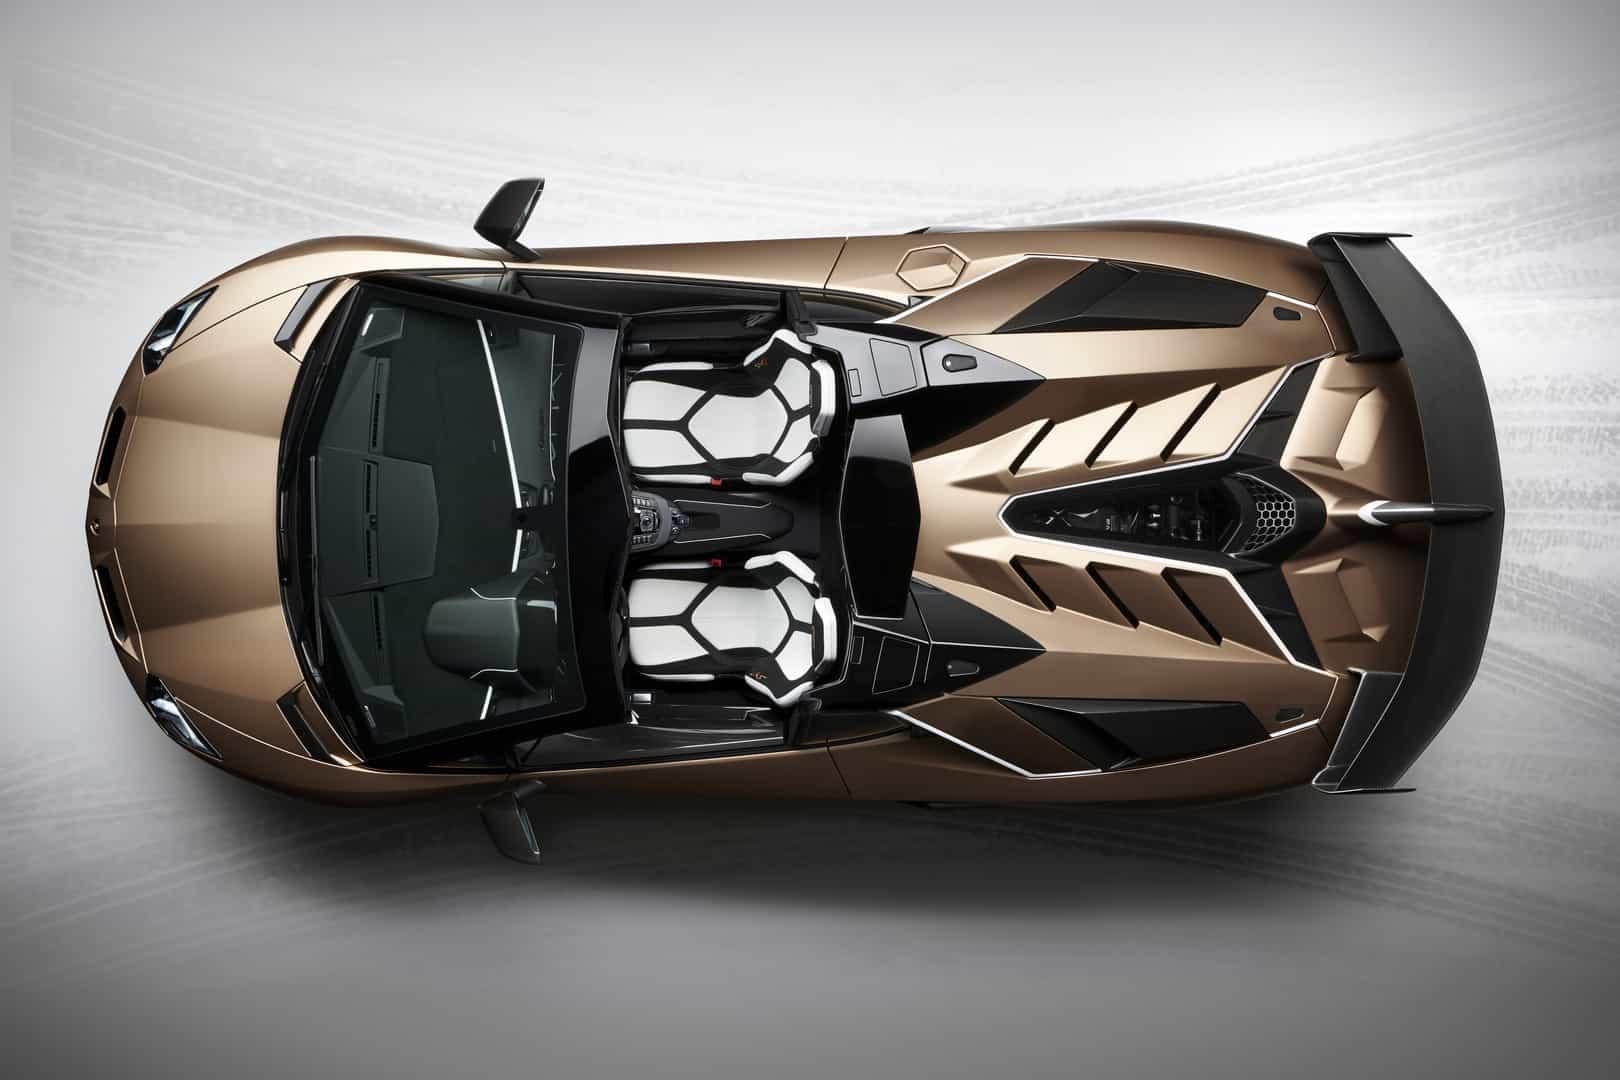 Lamborghini Aventador SVJ Roadster 12